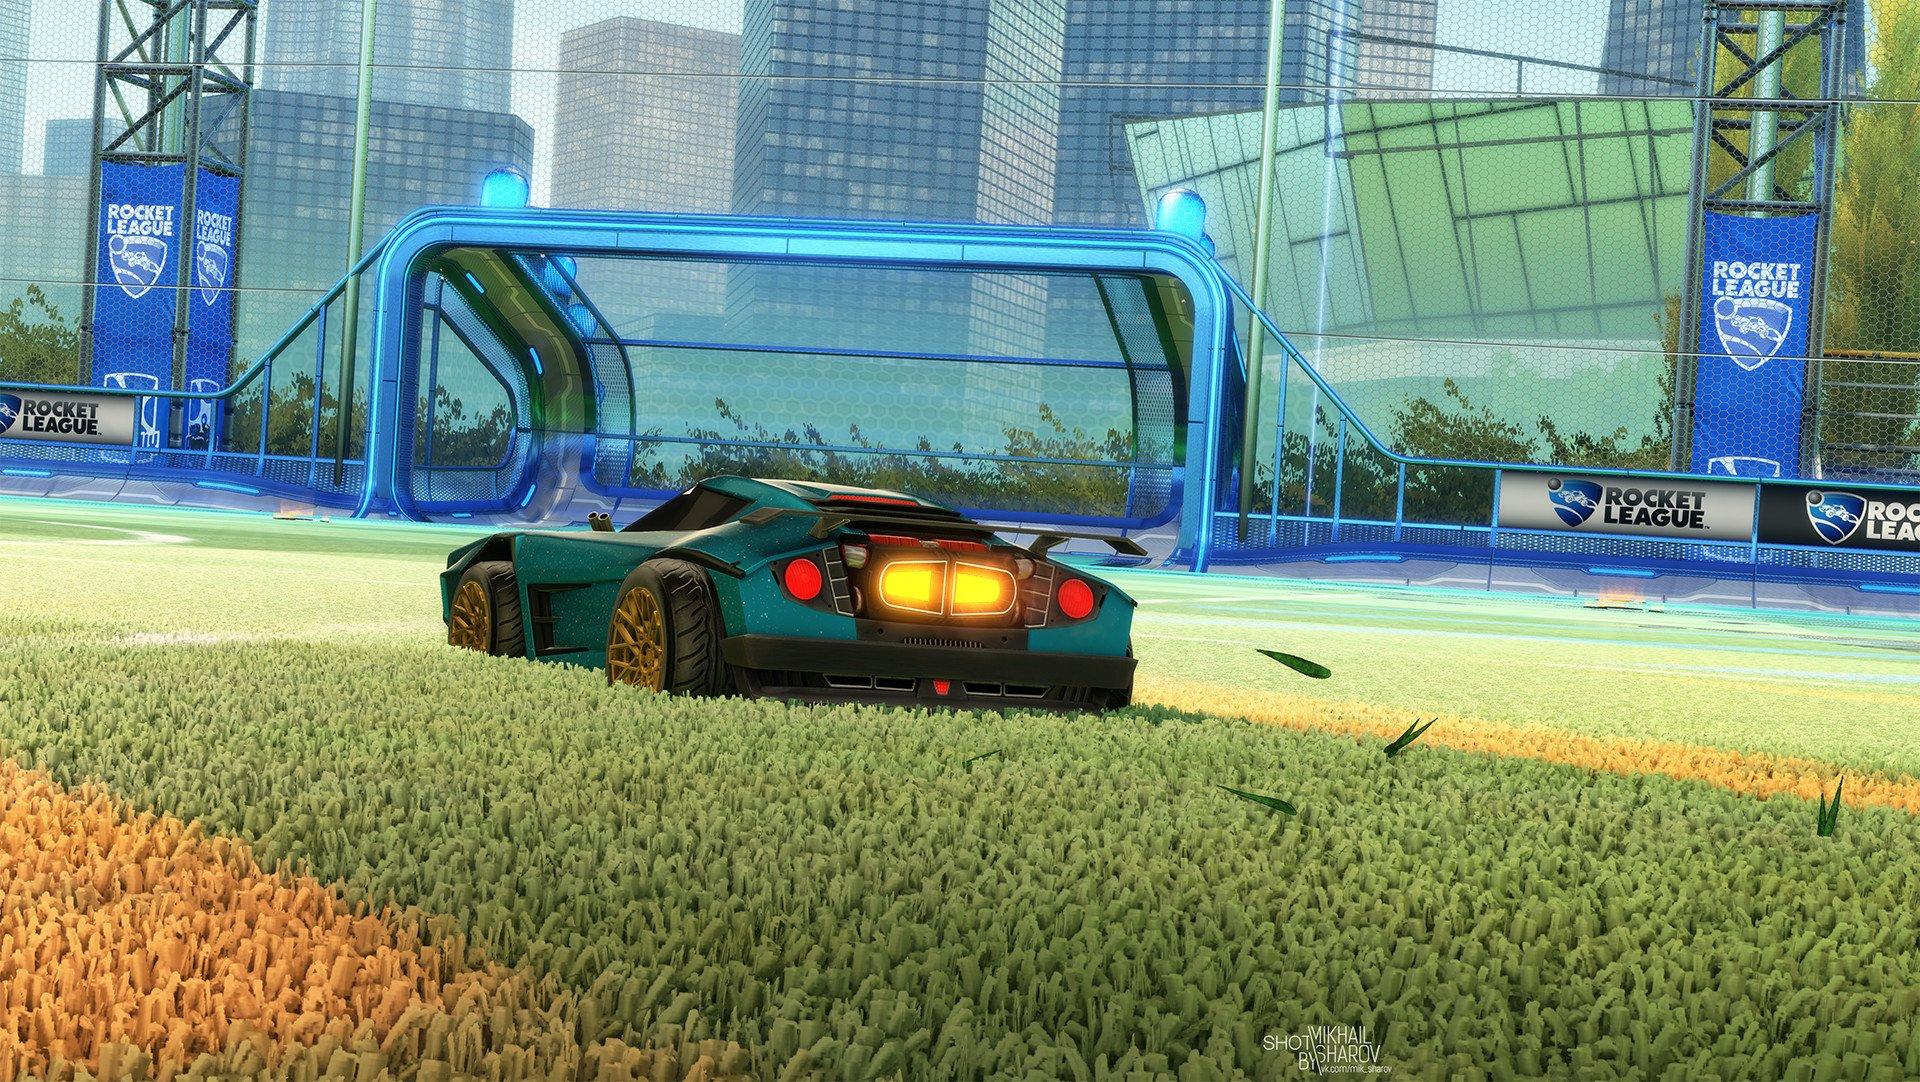 Video Game - Rocket League  Wallpaper